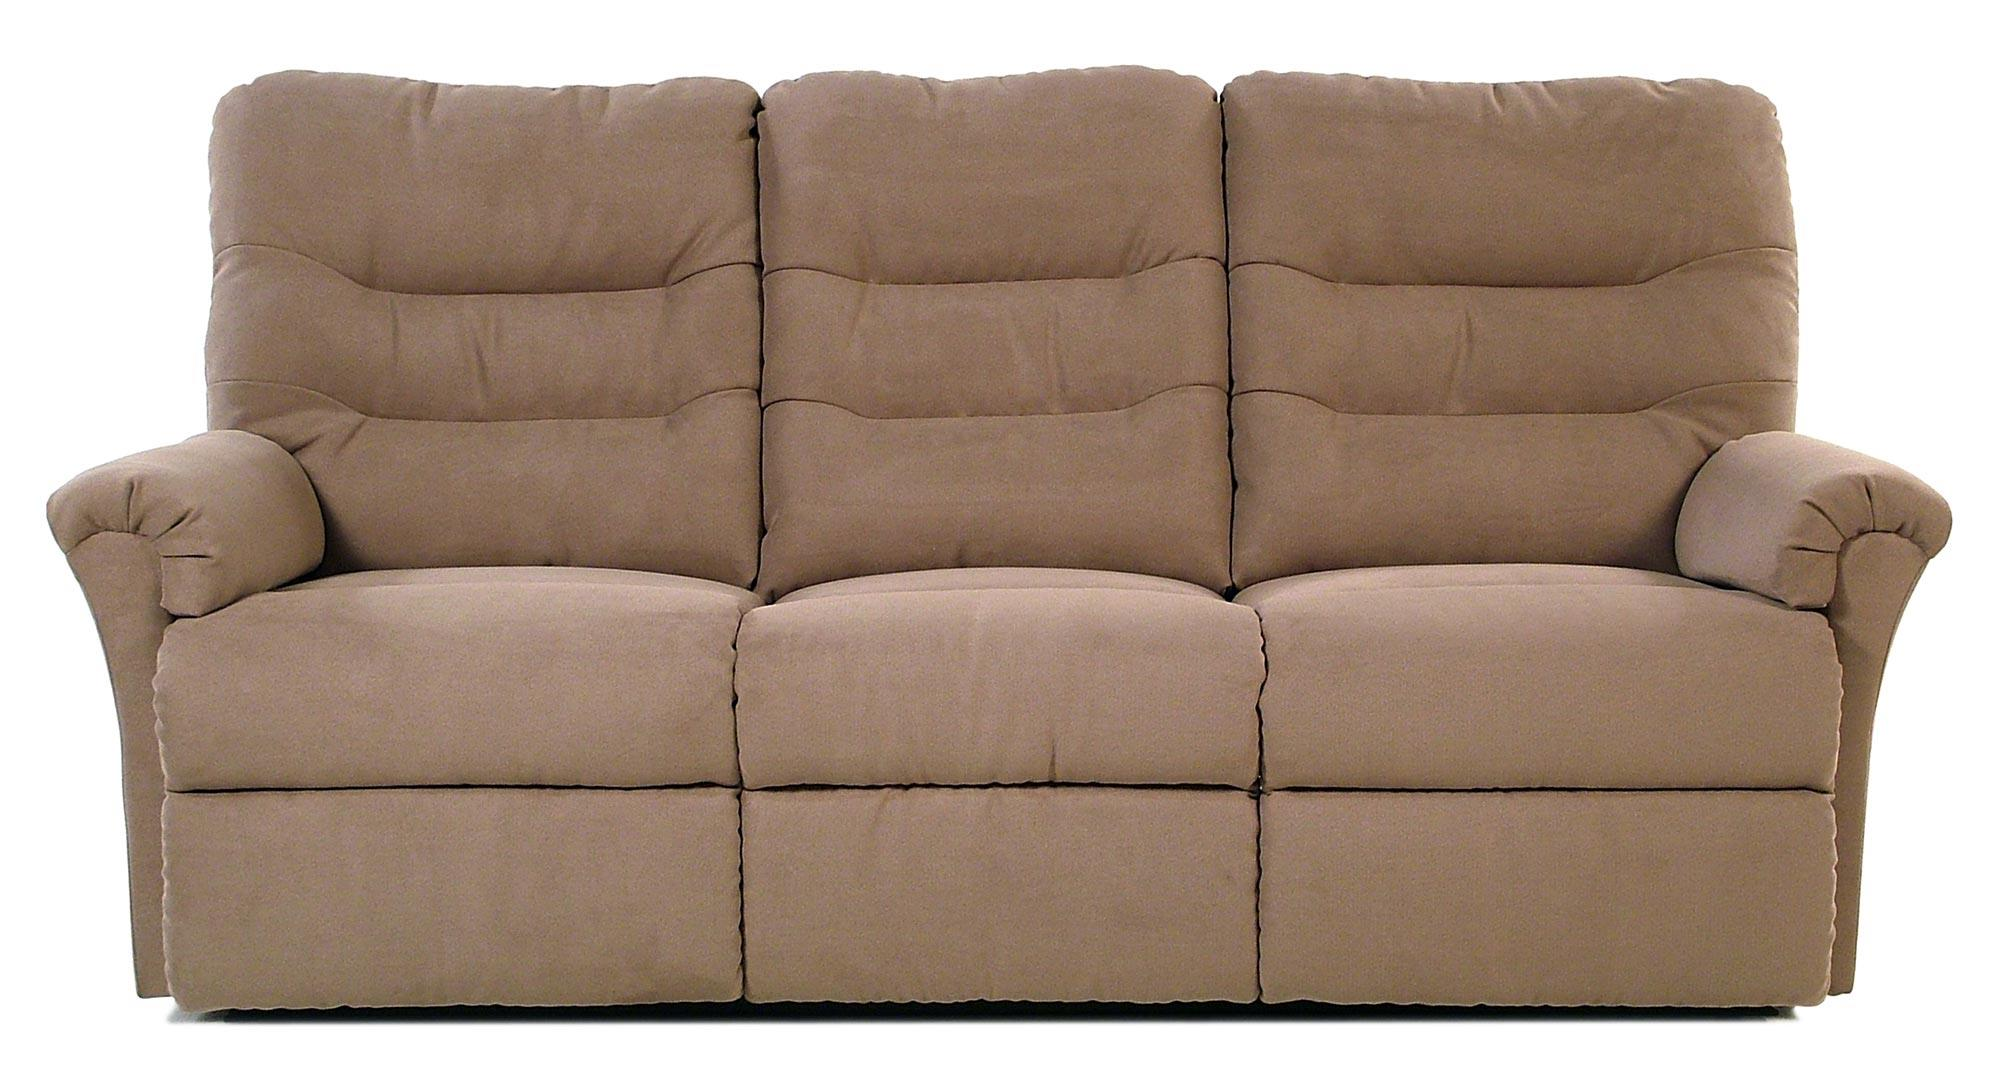 Palliser Mila Sofa Recliner - Item Number: 46039-51